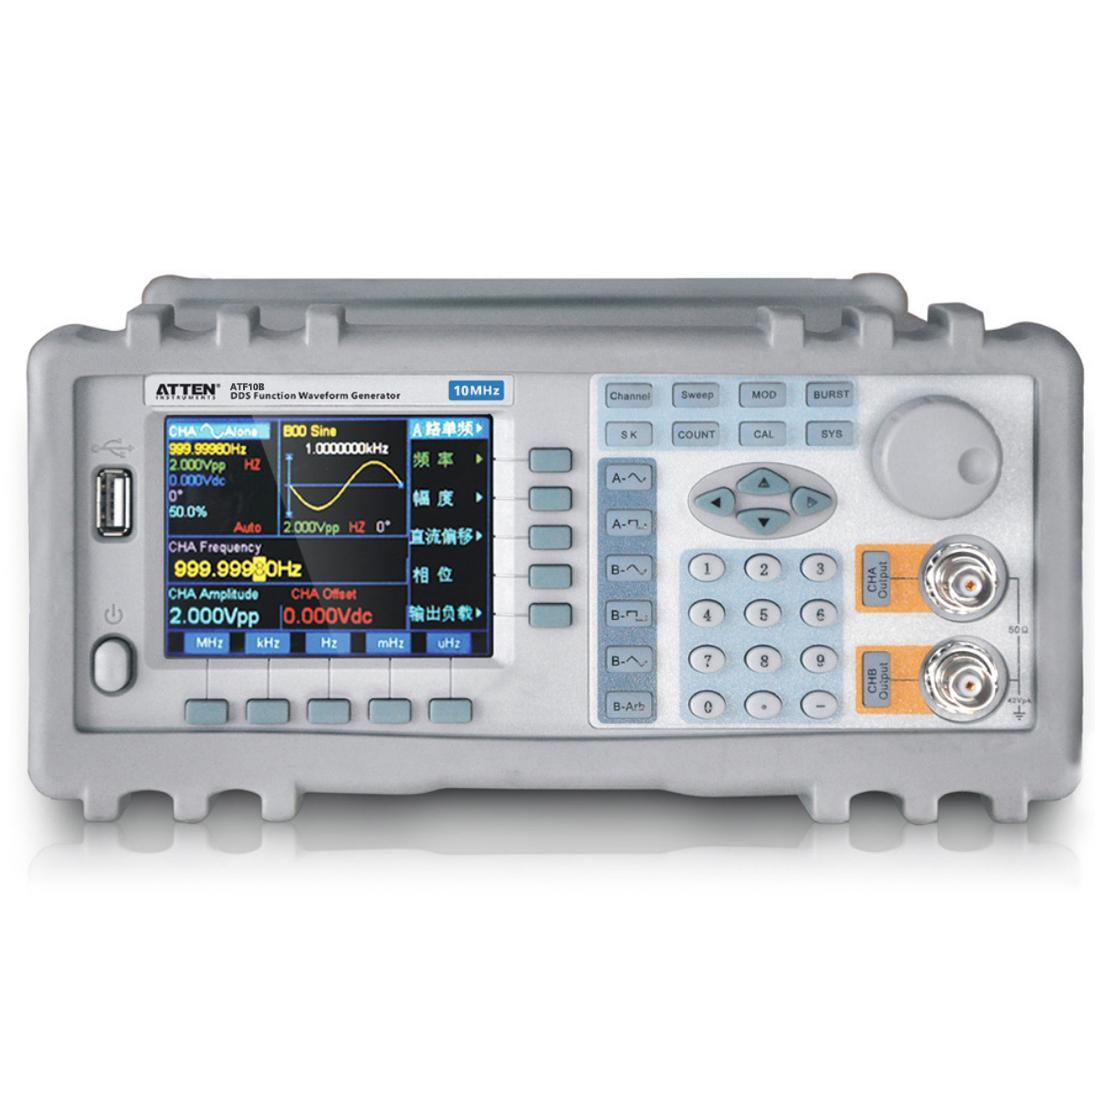 atf10b atf10b dds数字合成函数信号发生器atf10b代理atf10b现货